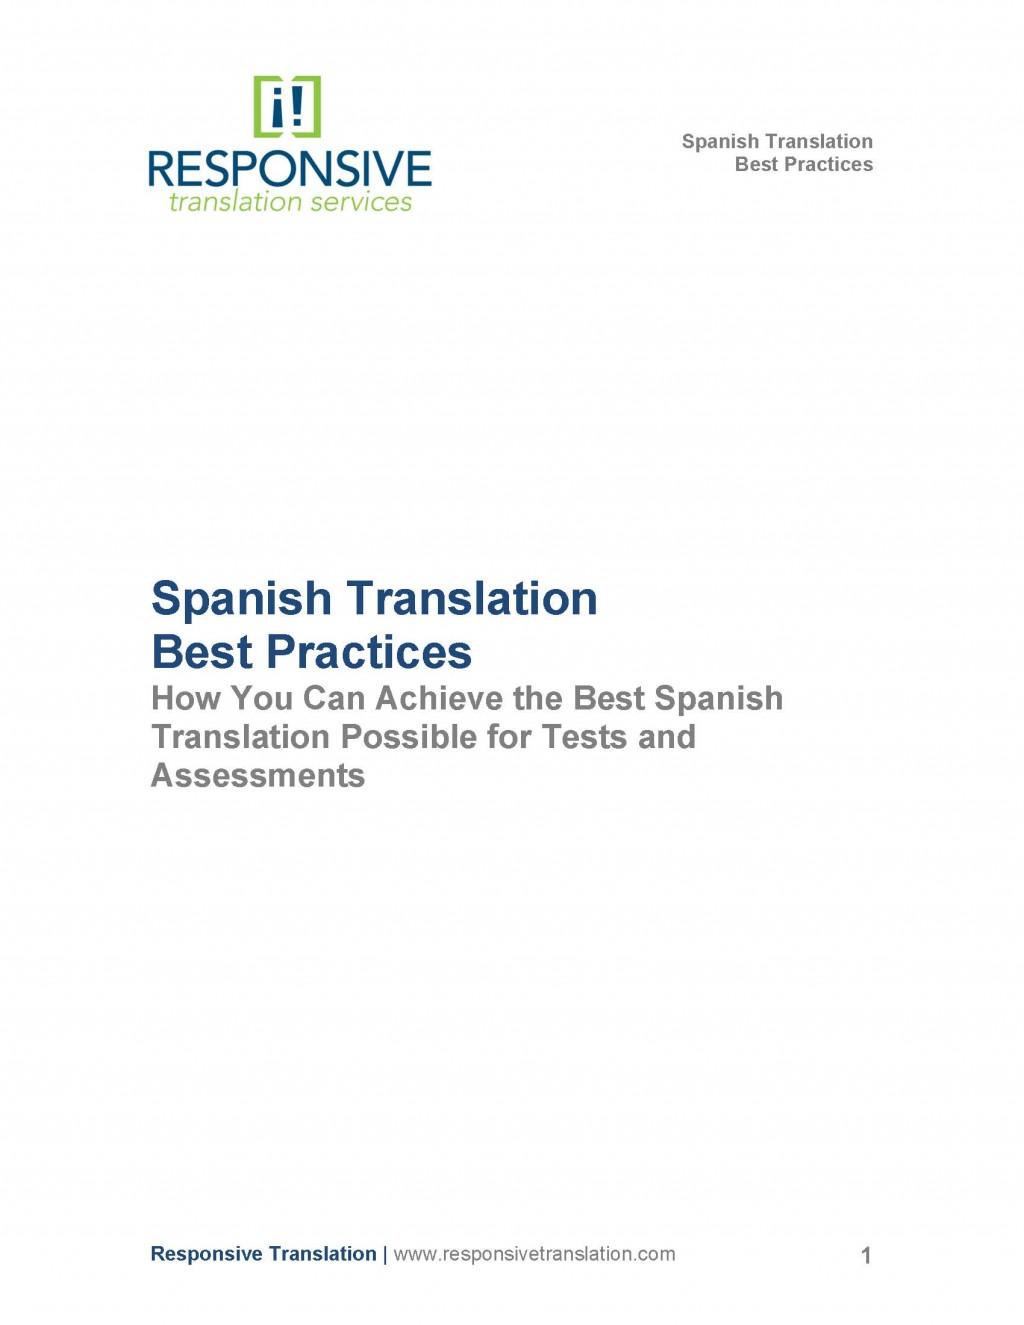 009 Essay Example Spanish White Paper Marvelous Urban Dictionary Joke Spanishdict Large